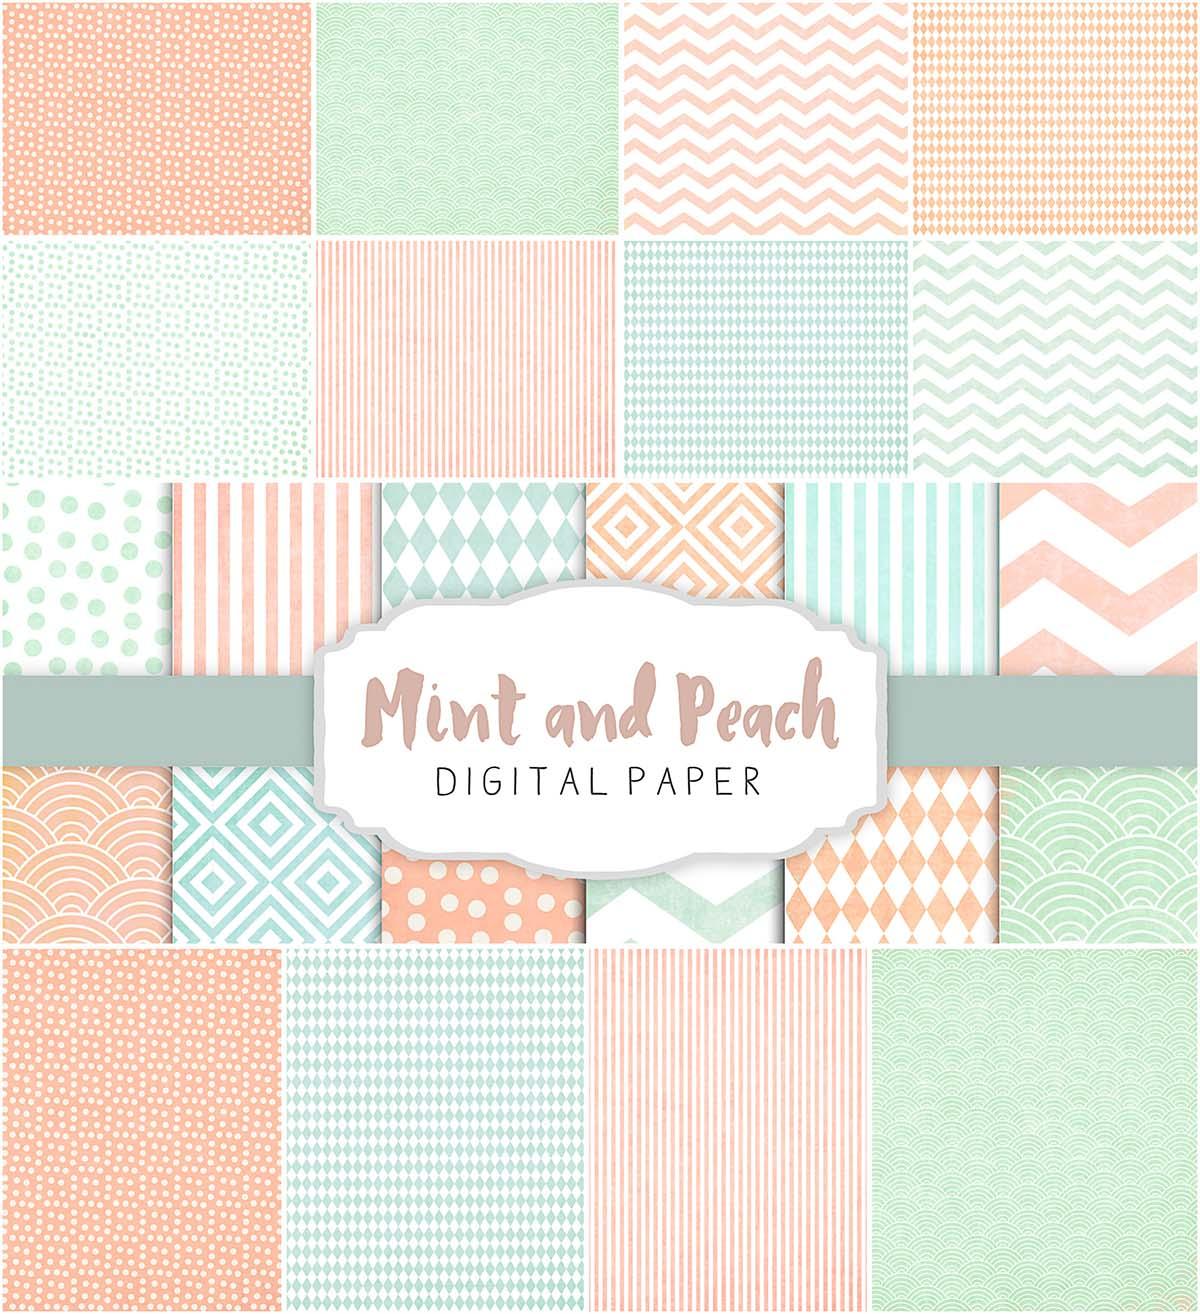 Beige and peach patterns